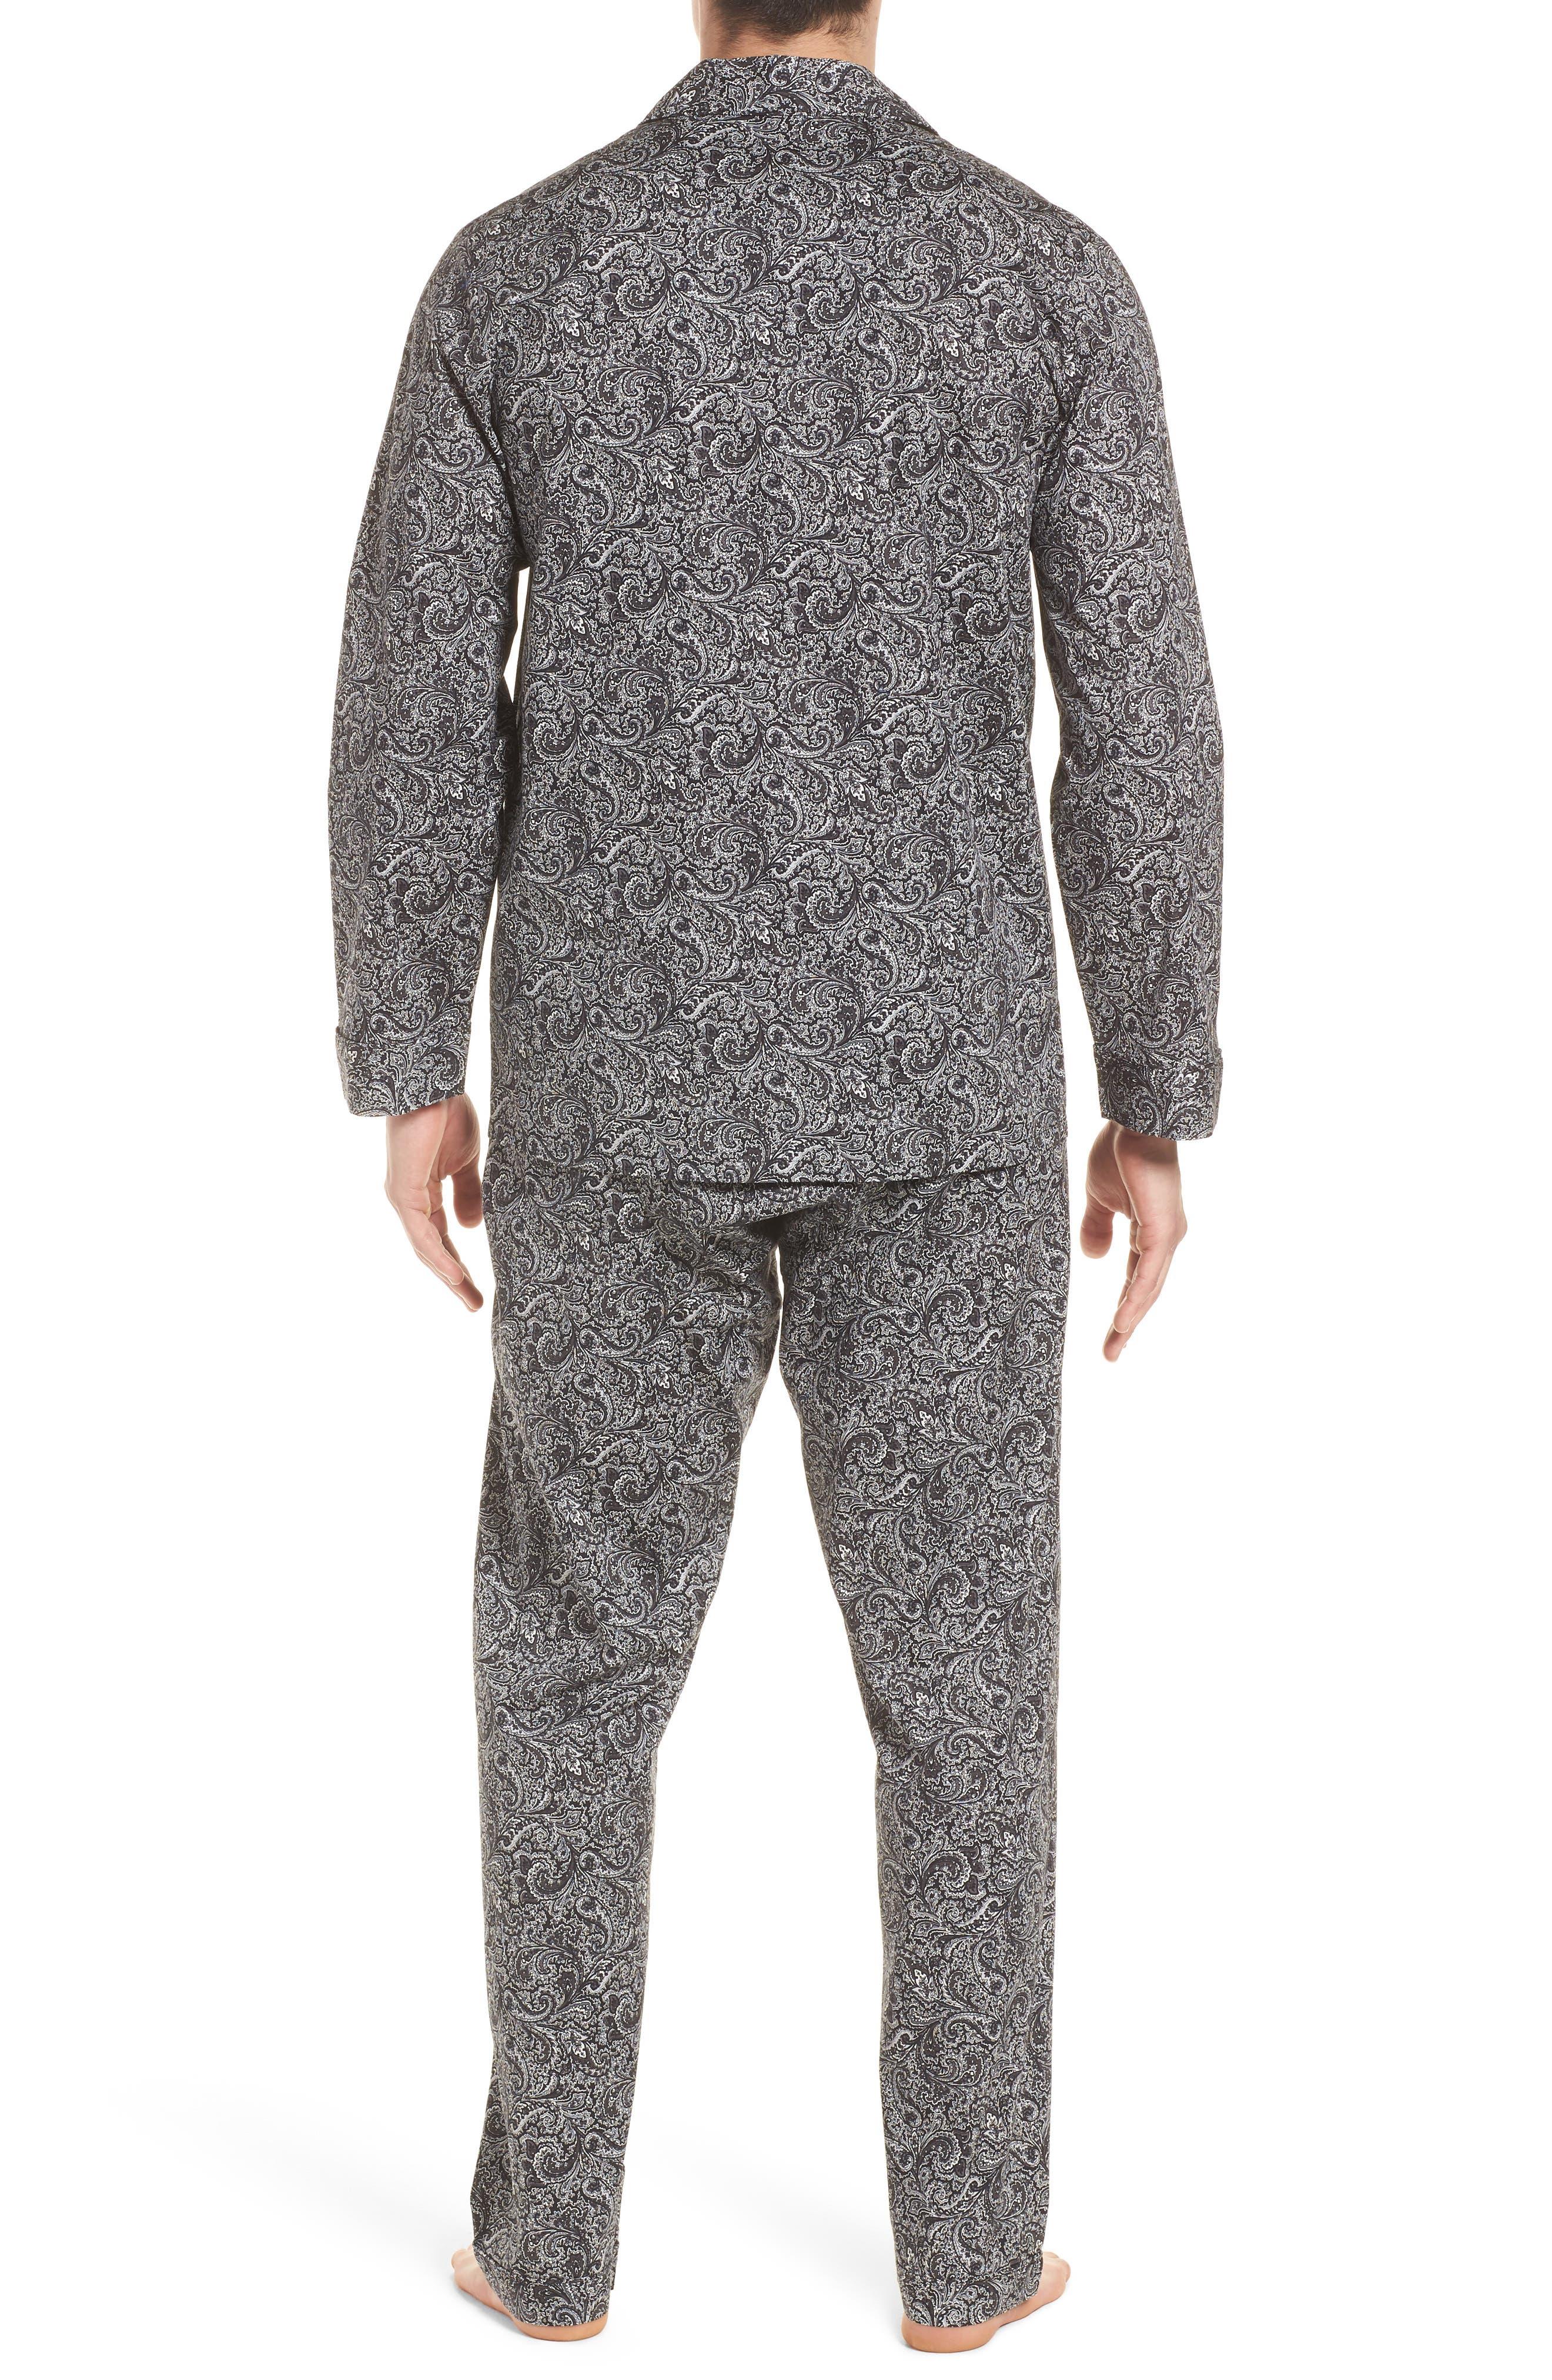 MAJESTIC INTERNATIONAL, Starling Pajama Set, Alternate thumbnail 2, color, BLACK PAISLEY